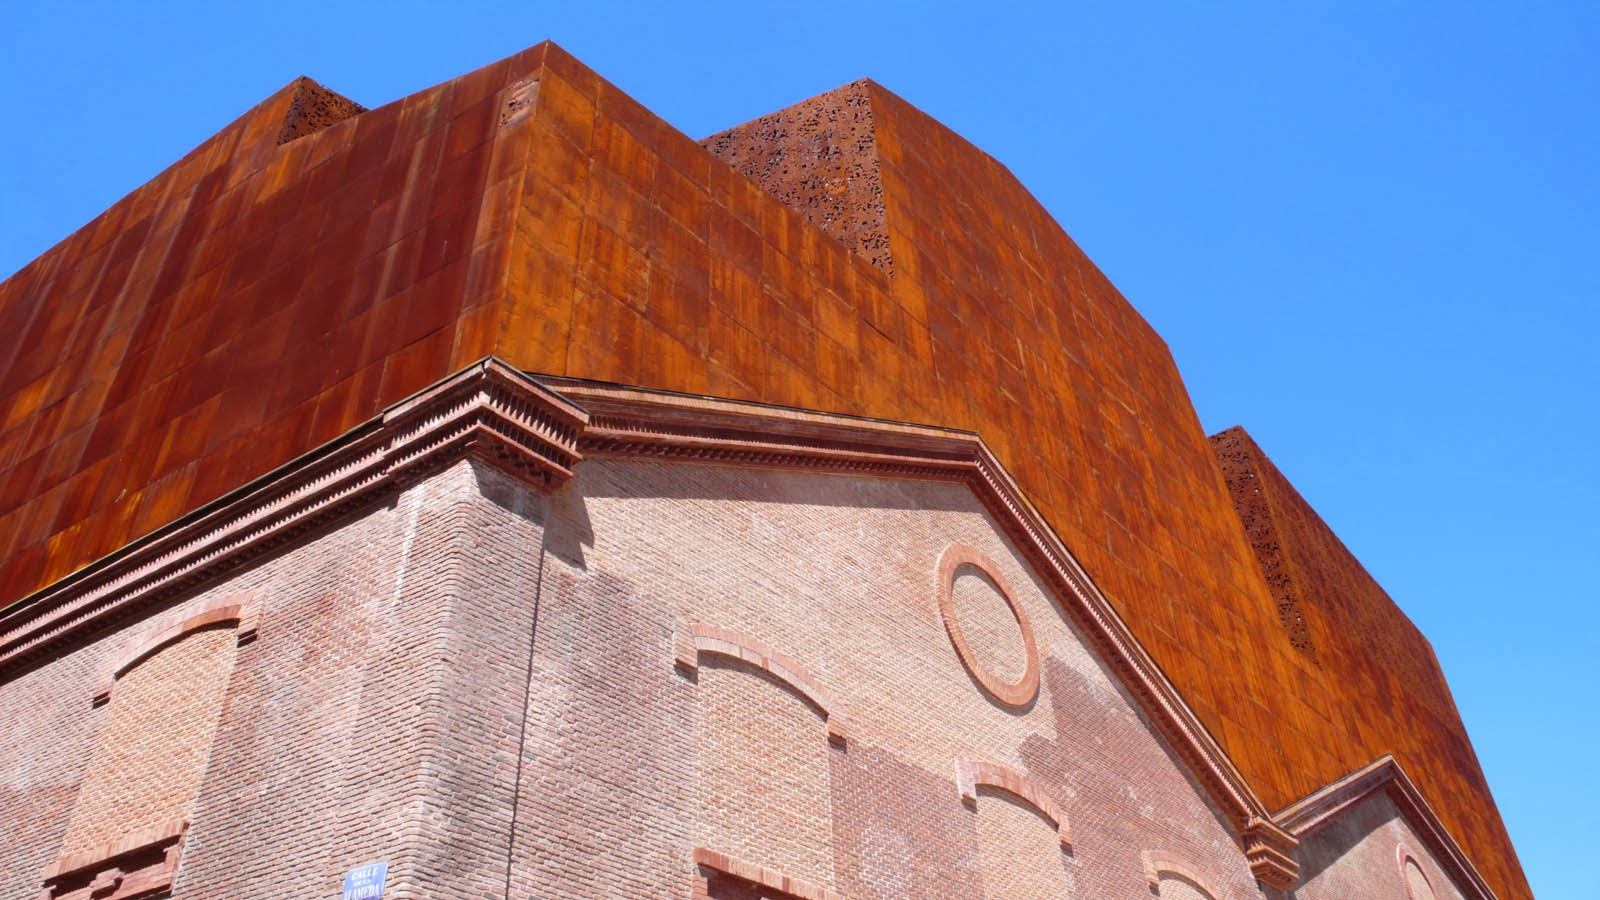 Amedeo liberatoscioli caixaforum madrid - Giardino verticale madrid ...